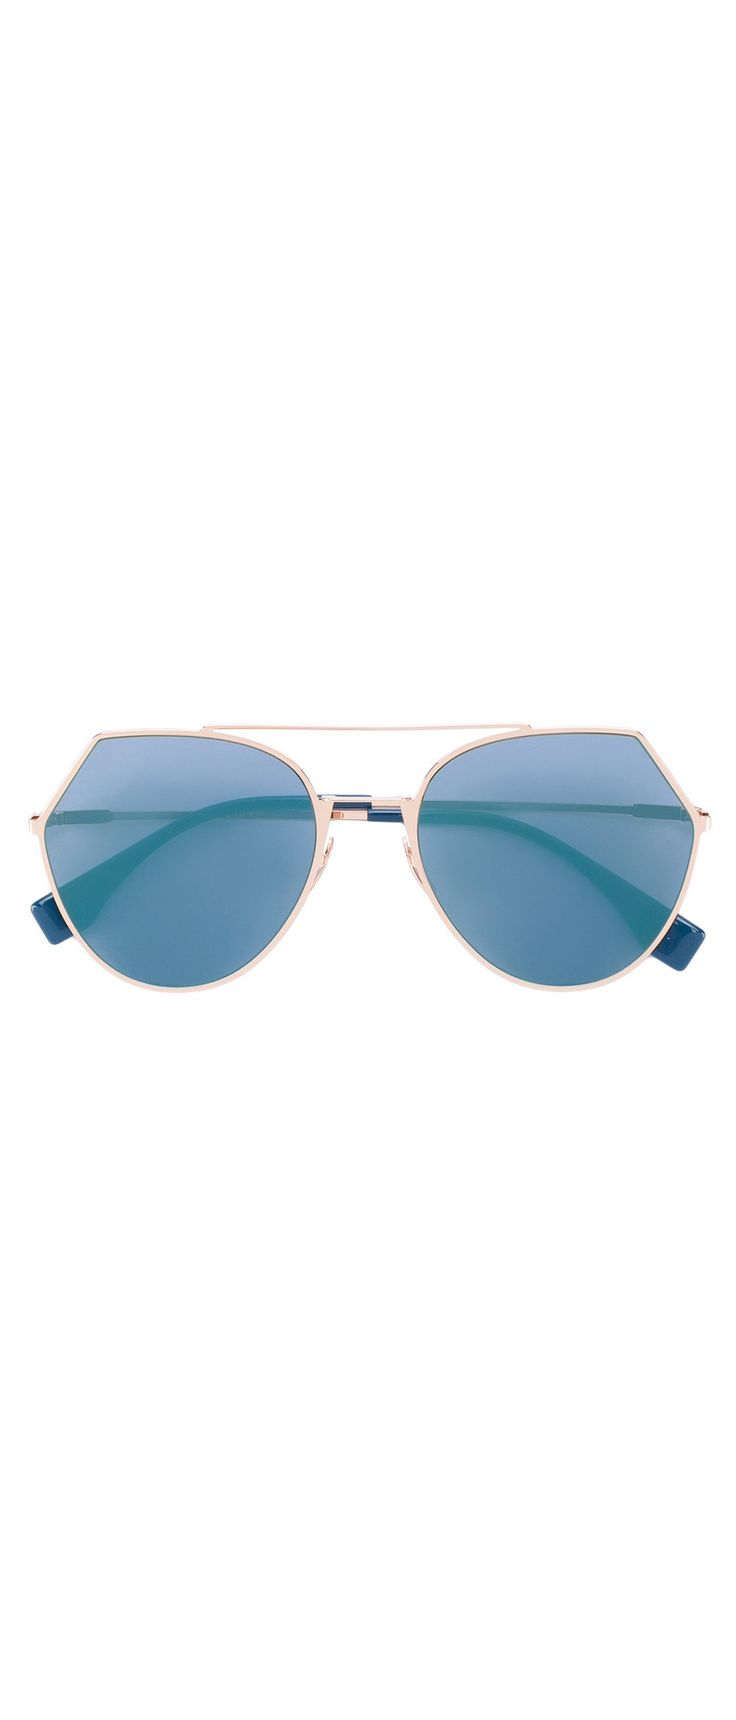 FENDI Eyeline sunglasses